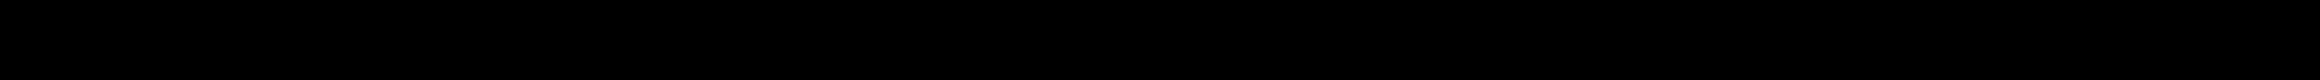 BOSCH 5962 5Z, 5962 80, 5962 F3, 5962 F4, 5962 N9 Bujía de encendido